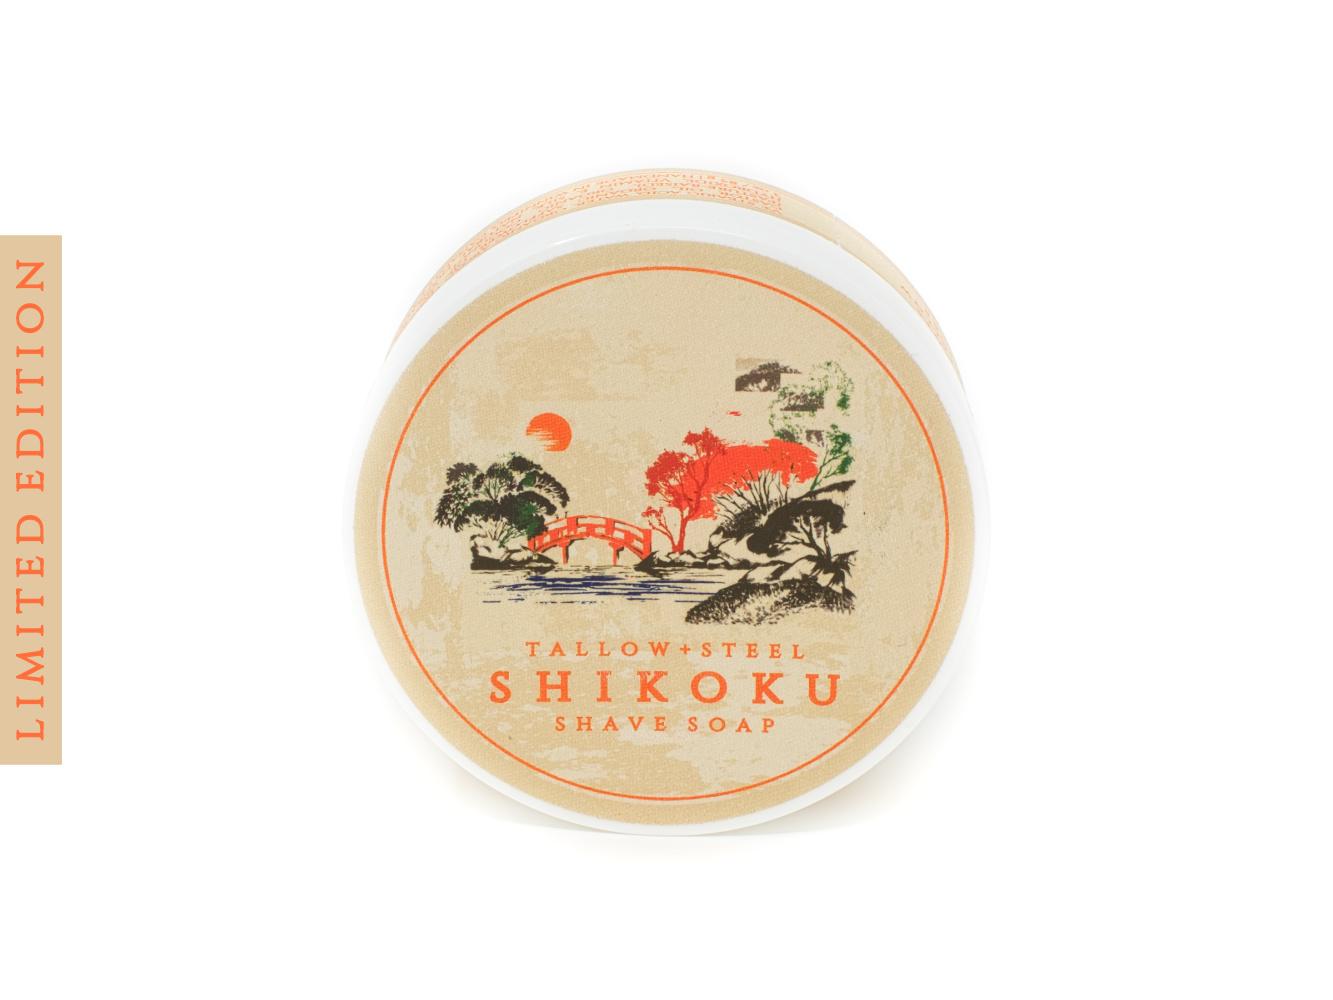 Tallow + Steel - Shikoku - Soap image